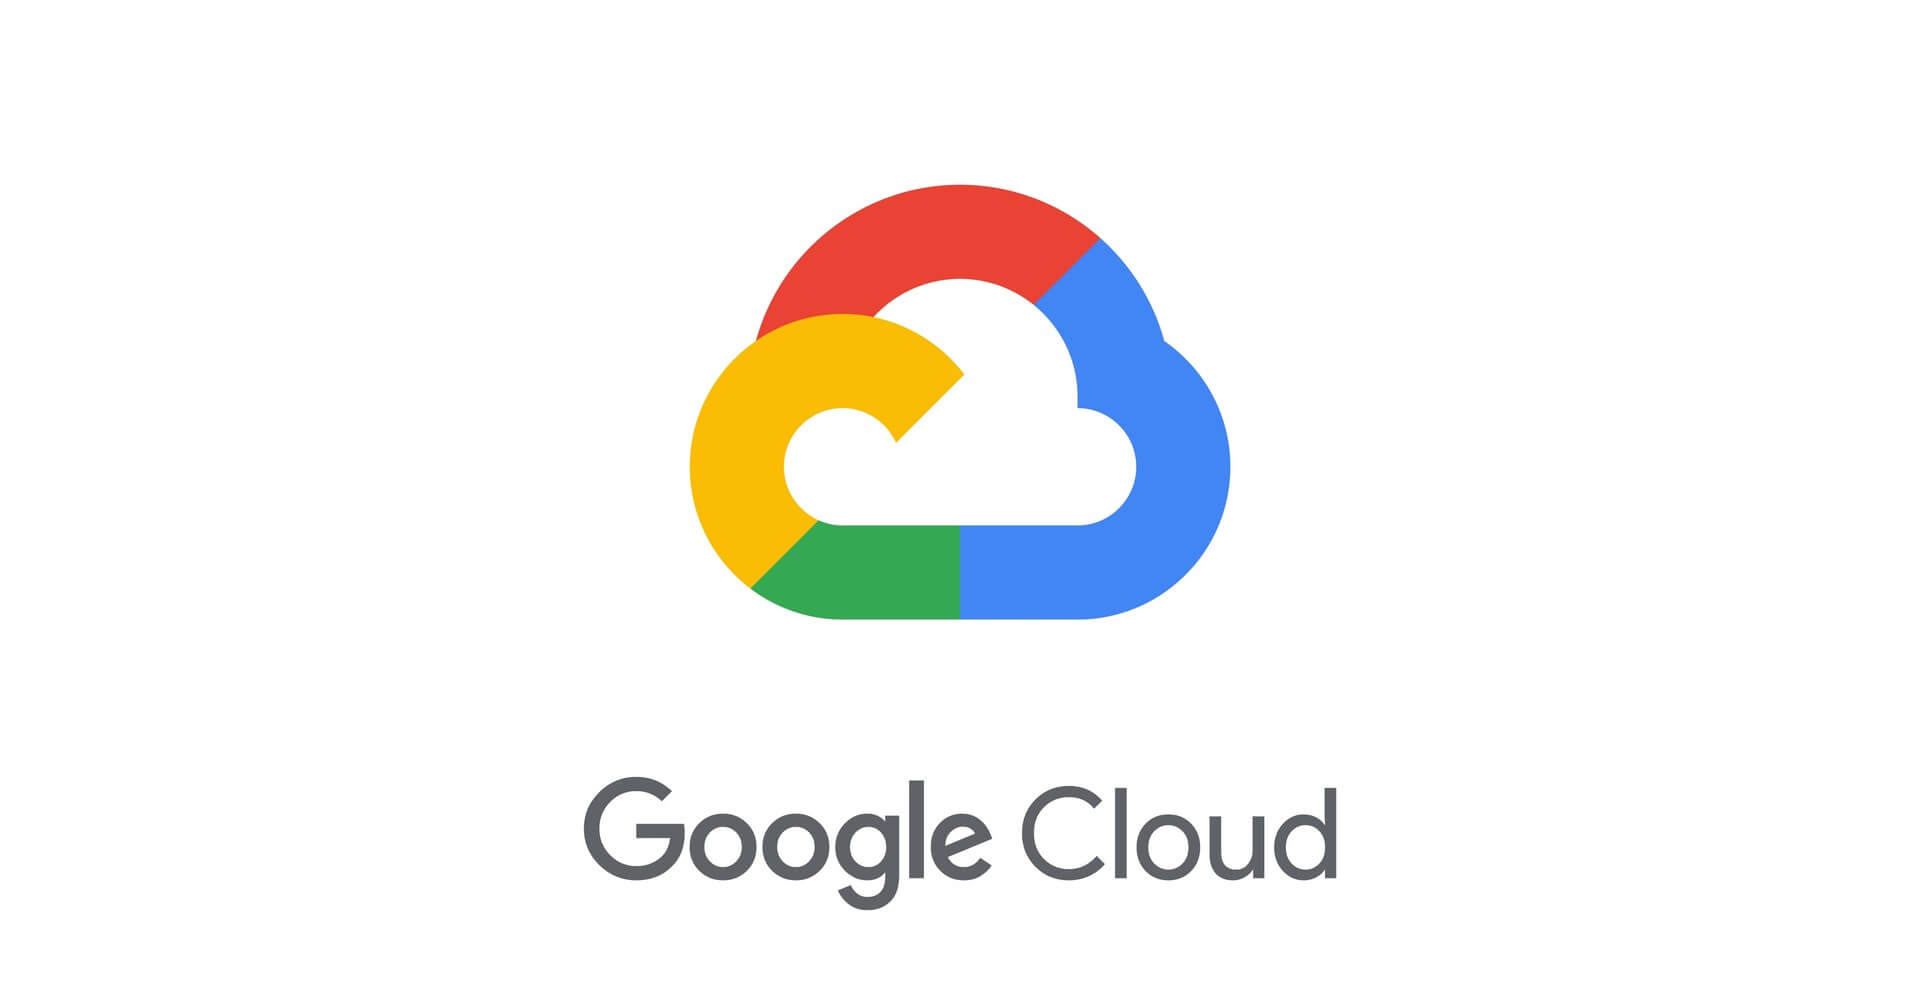 Google Cloud logosu